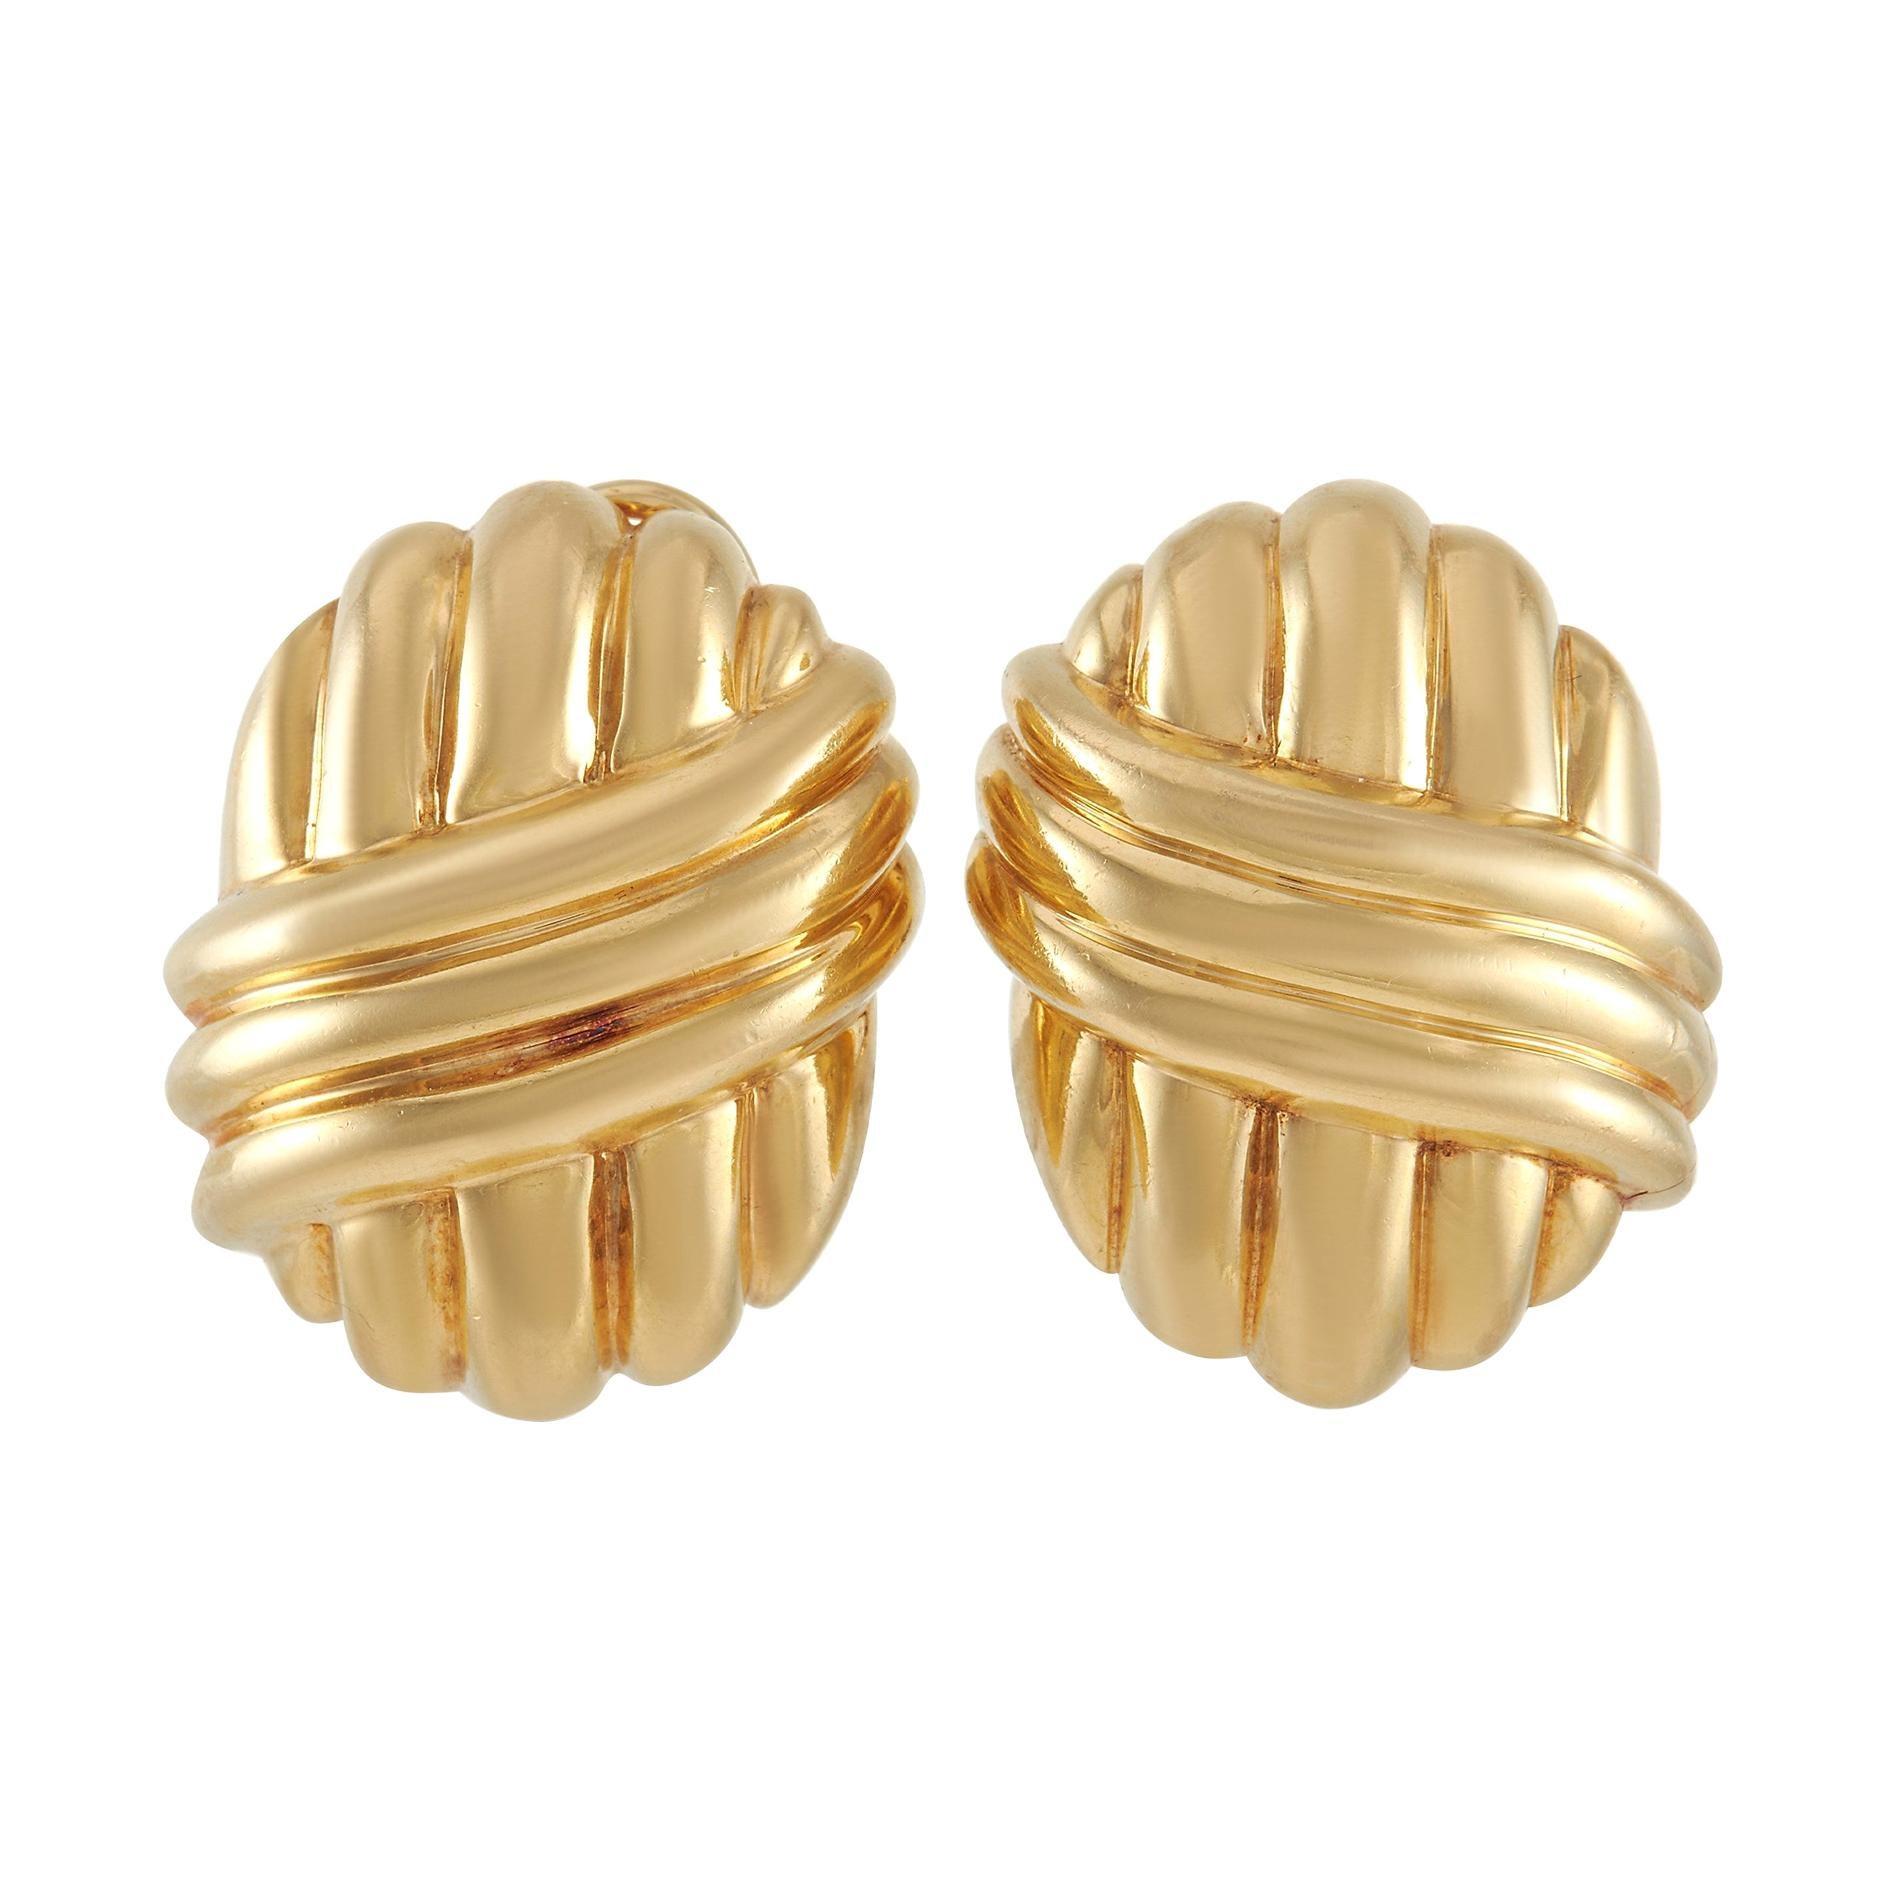 Van Cleef & Arpels 18k Yellow Gold Shell Clip-On Earrings